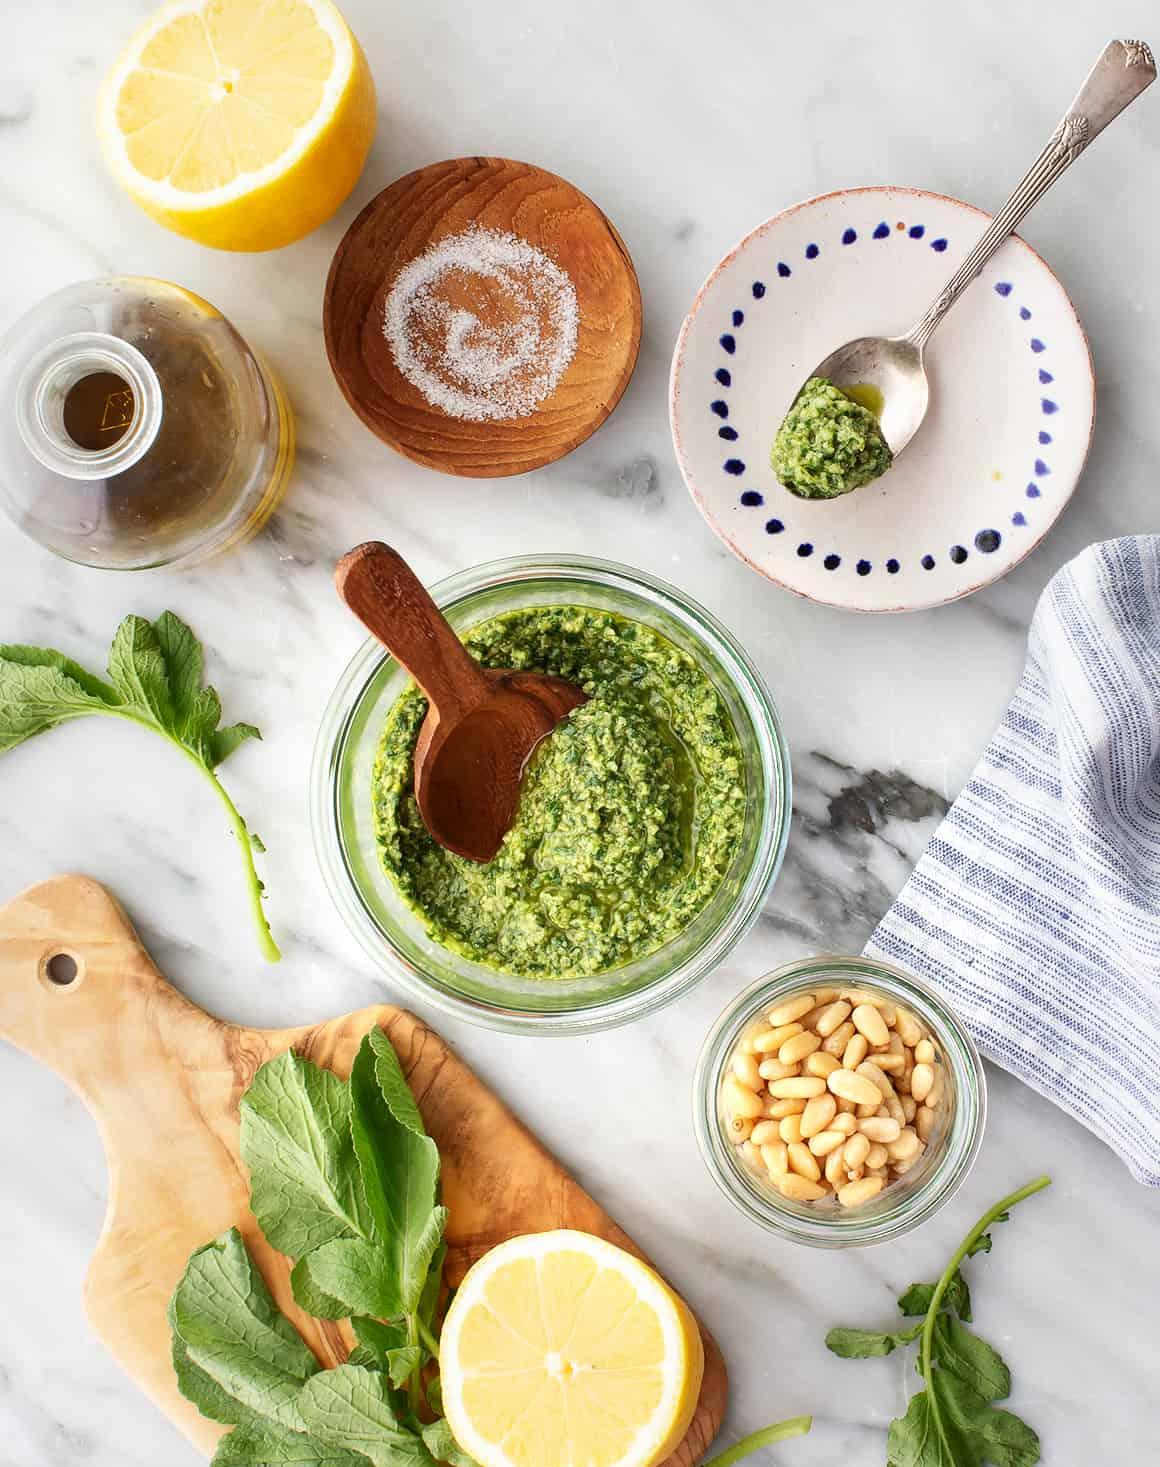 Radish top pesto recipe